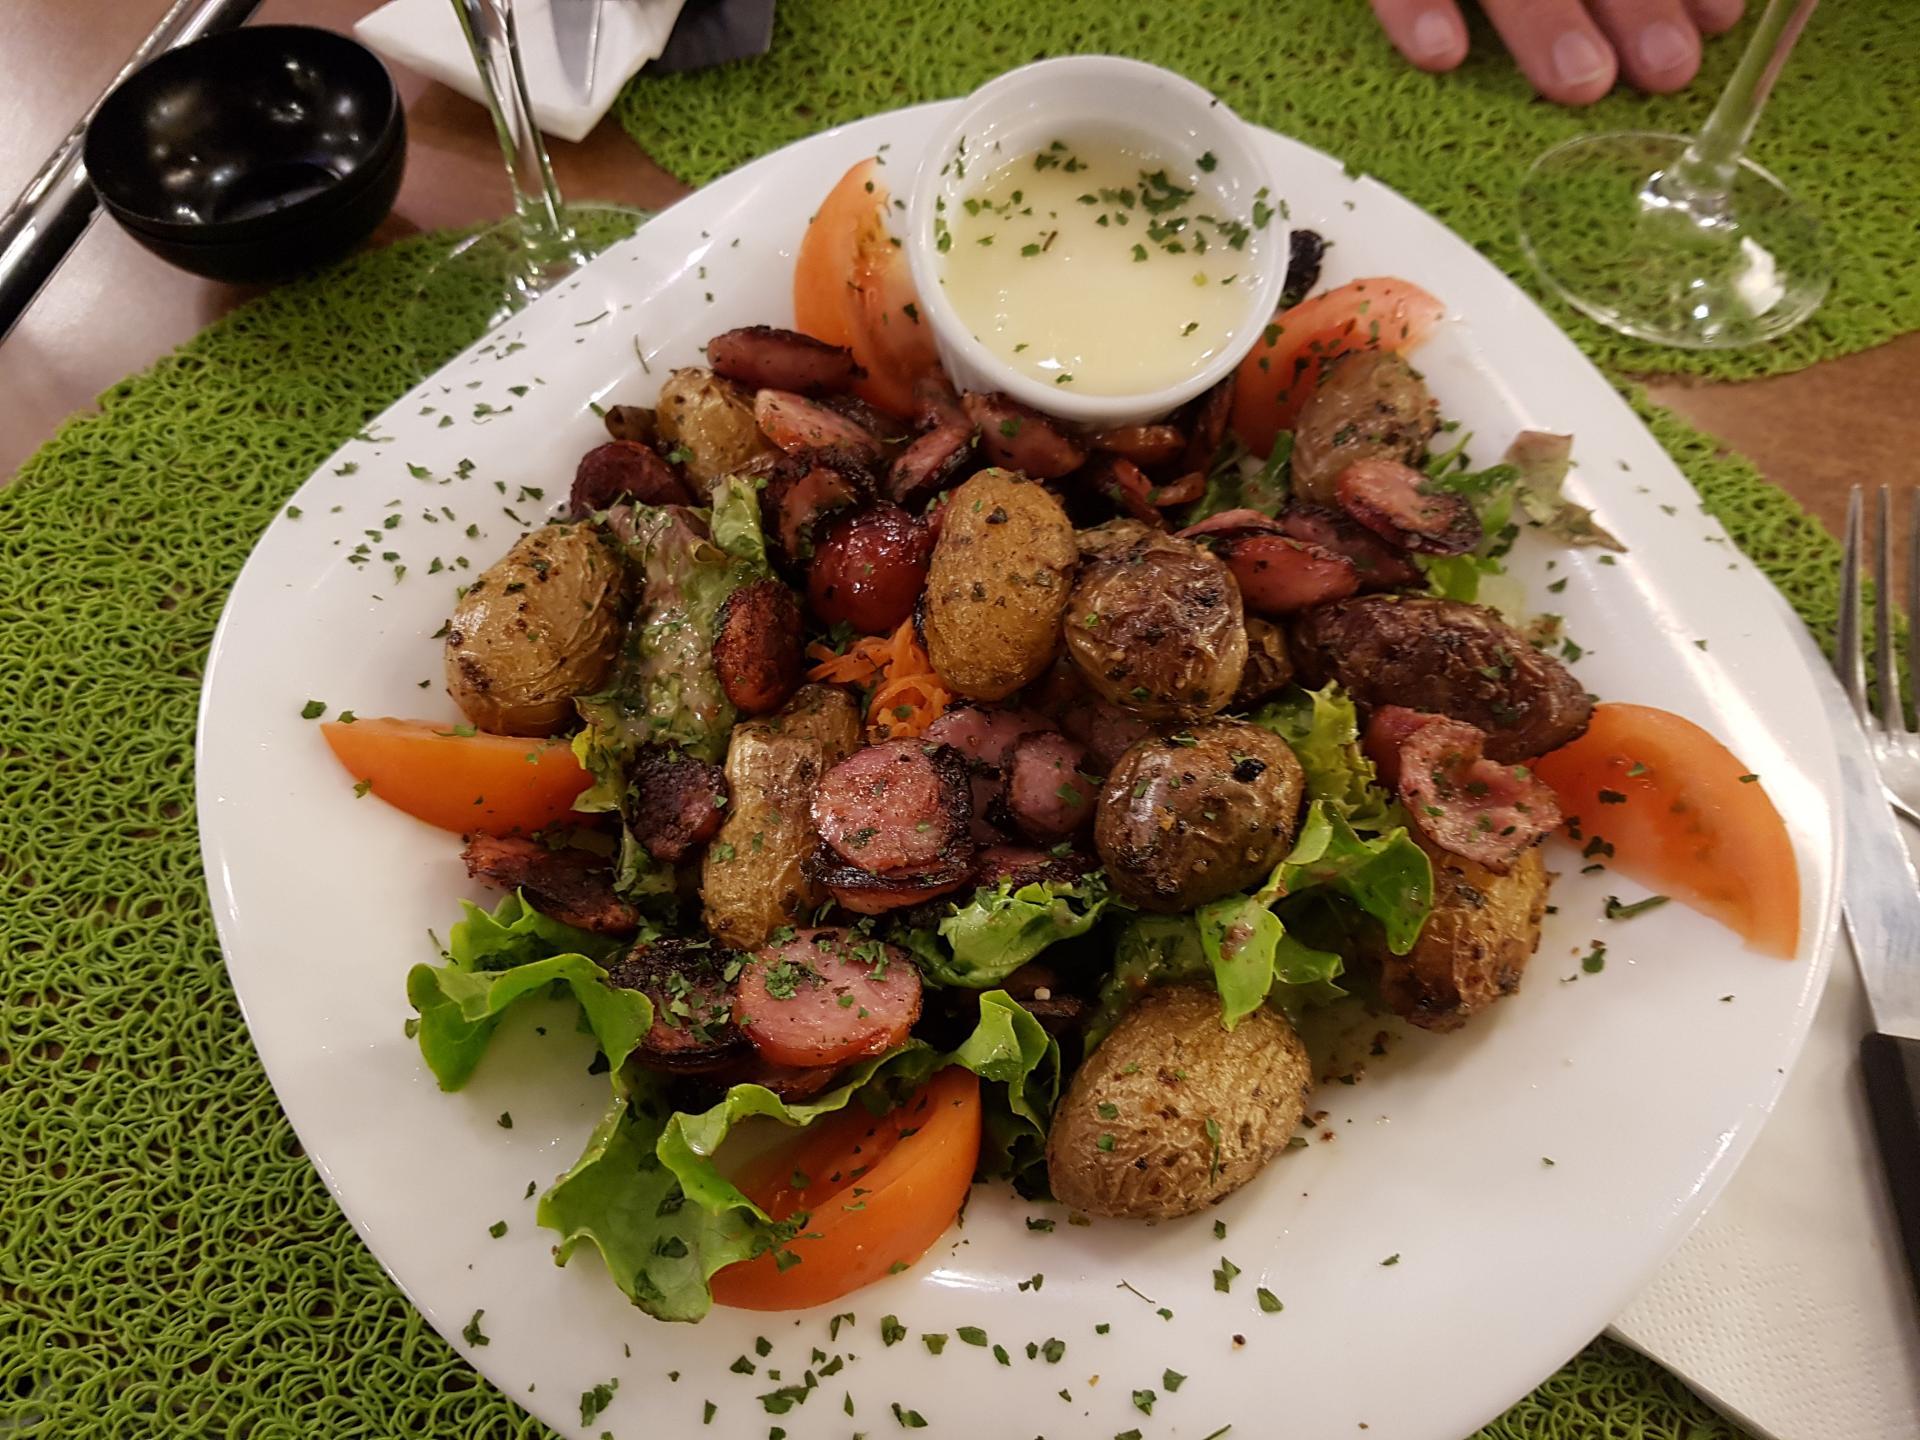 Salade francontoise